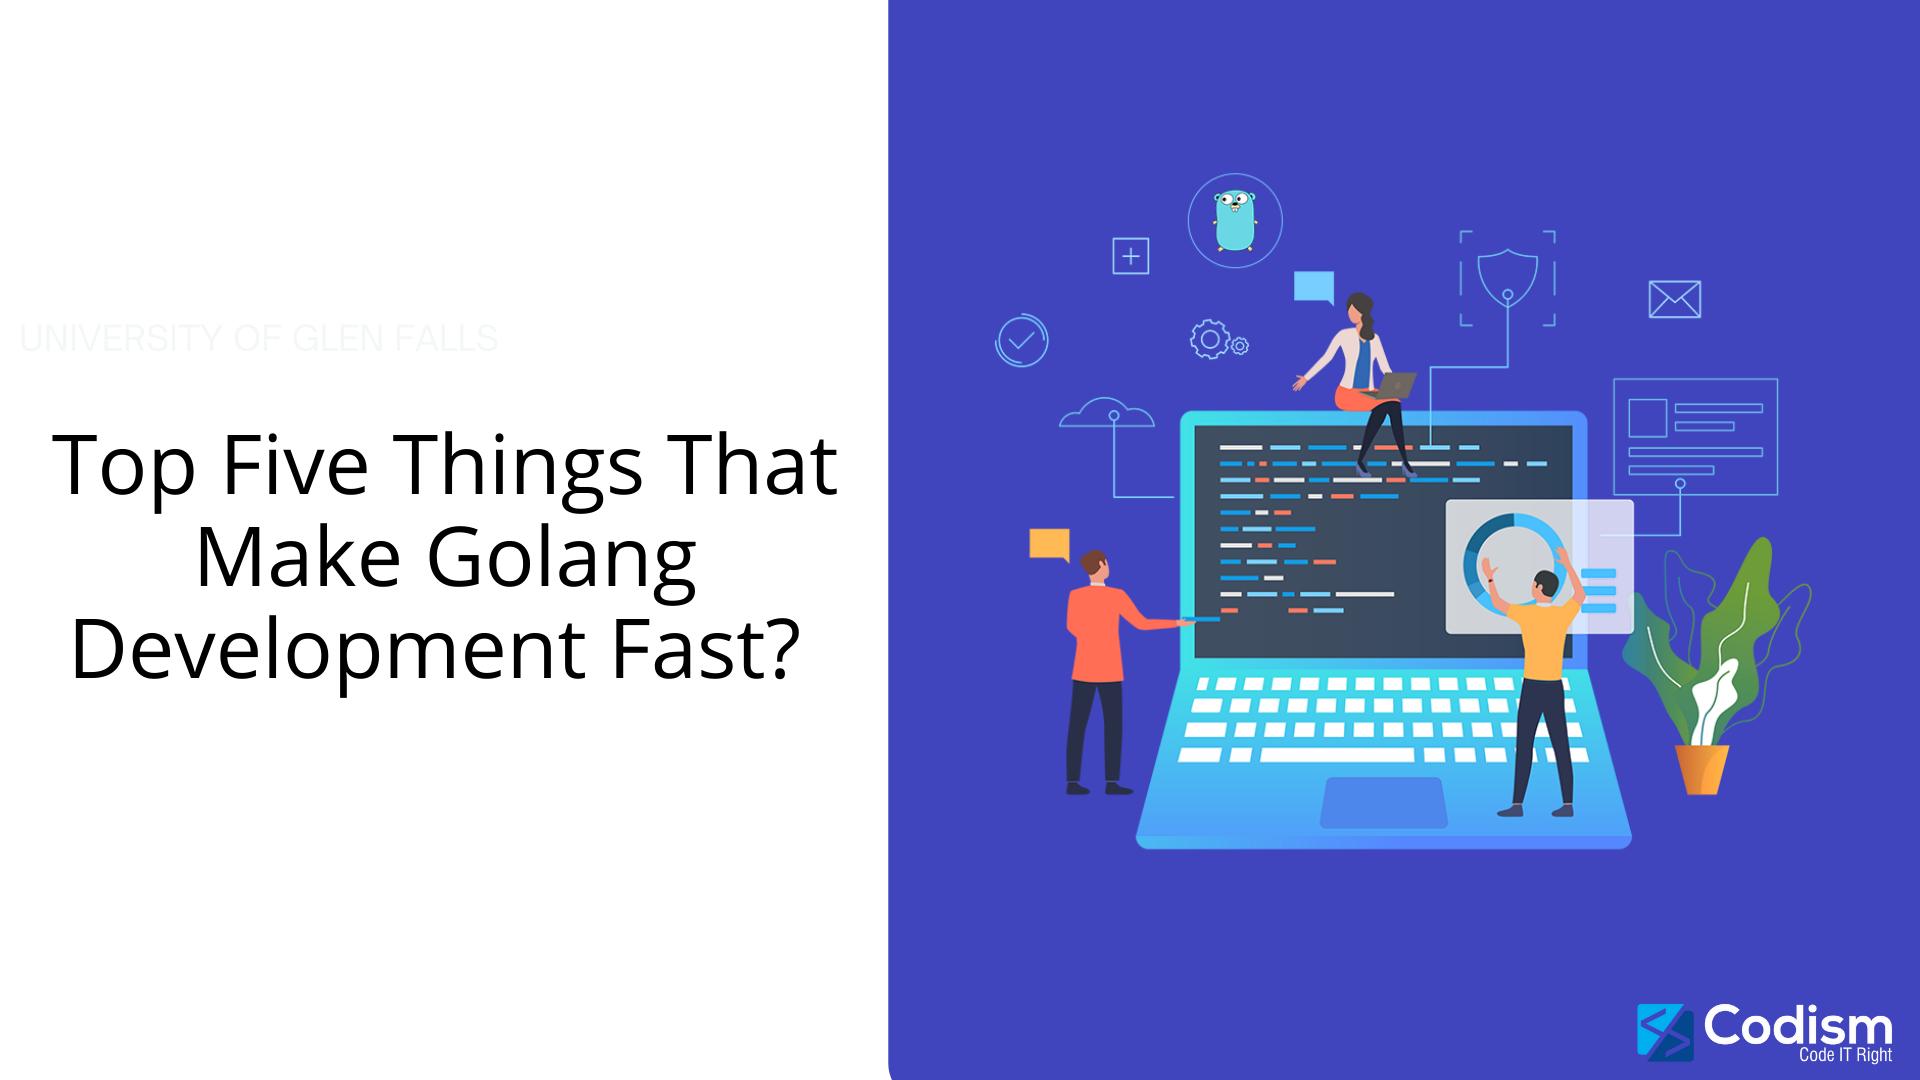 golang development